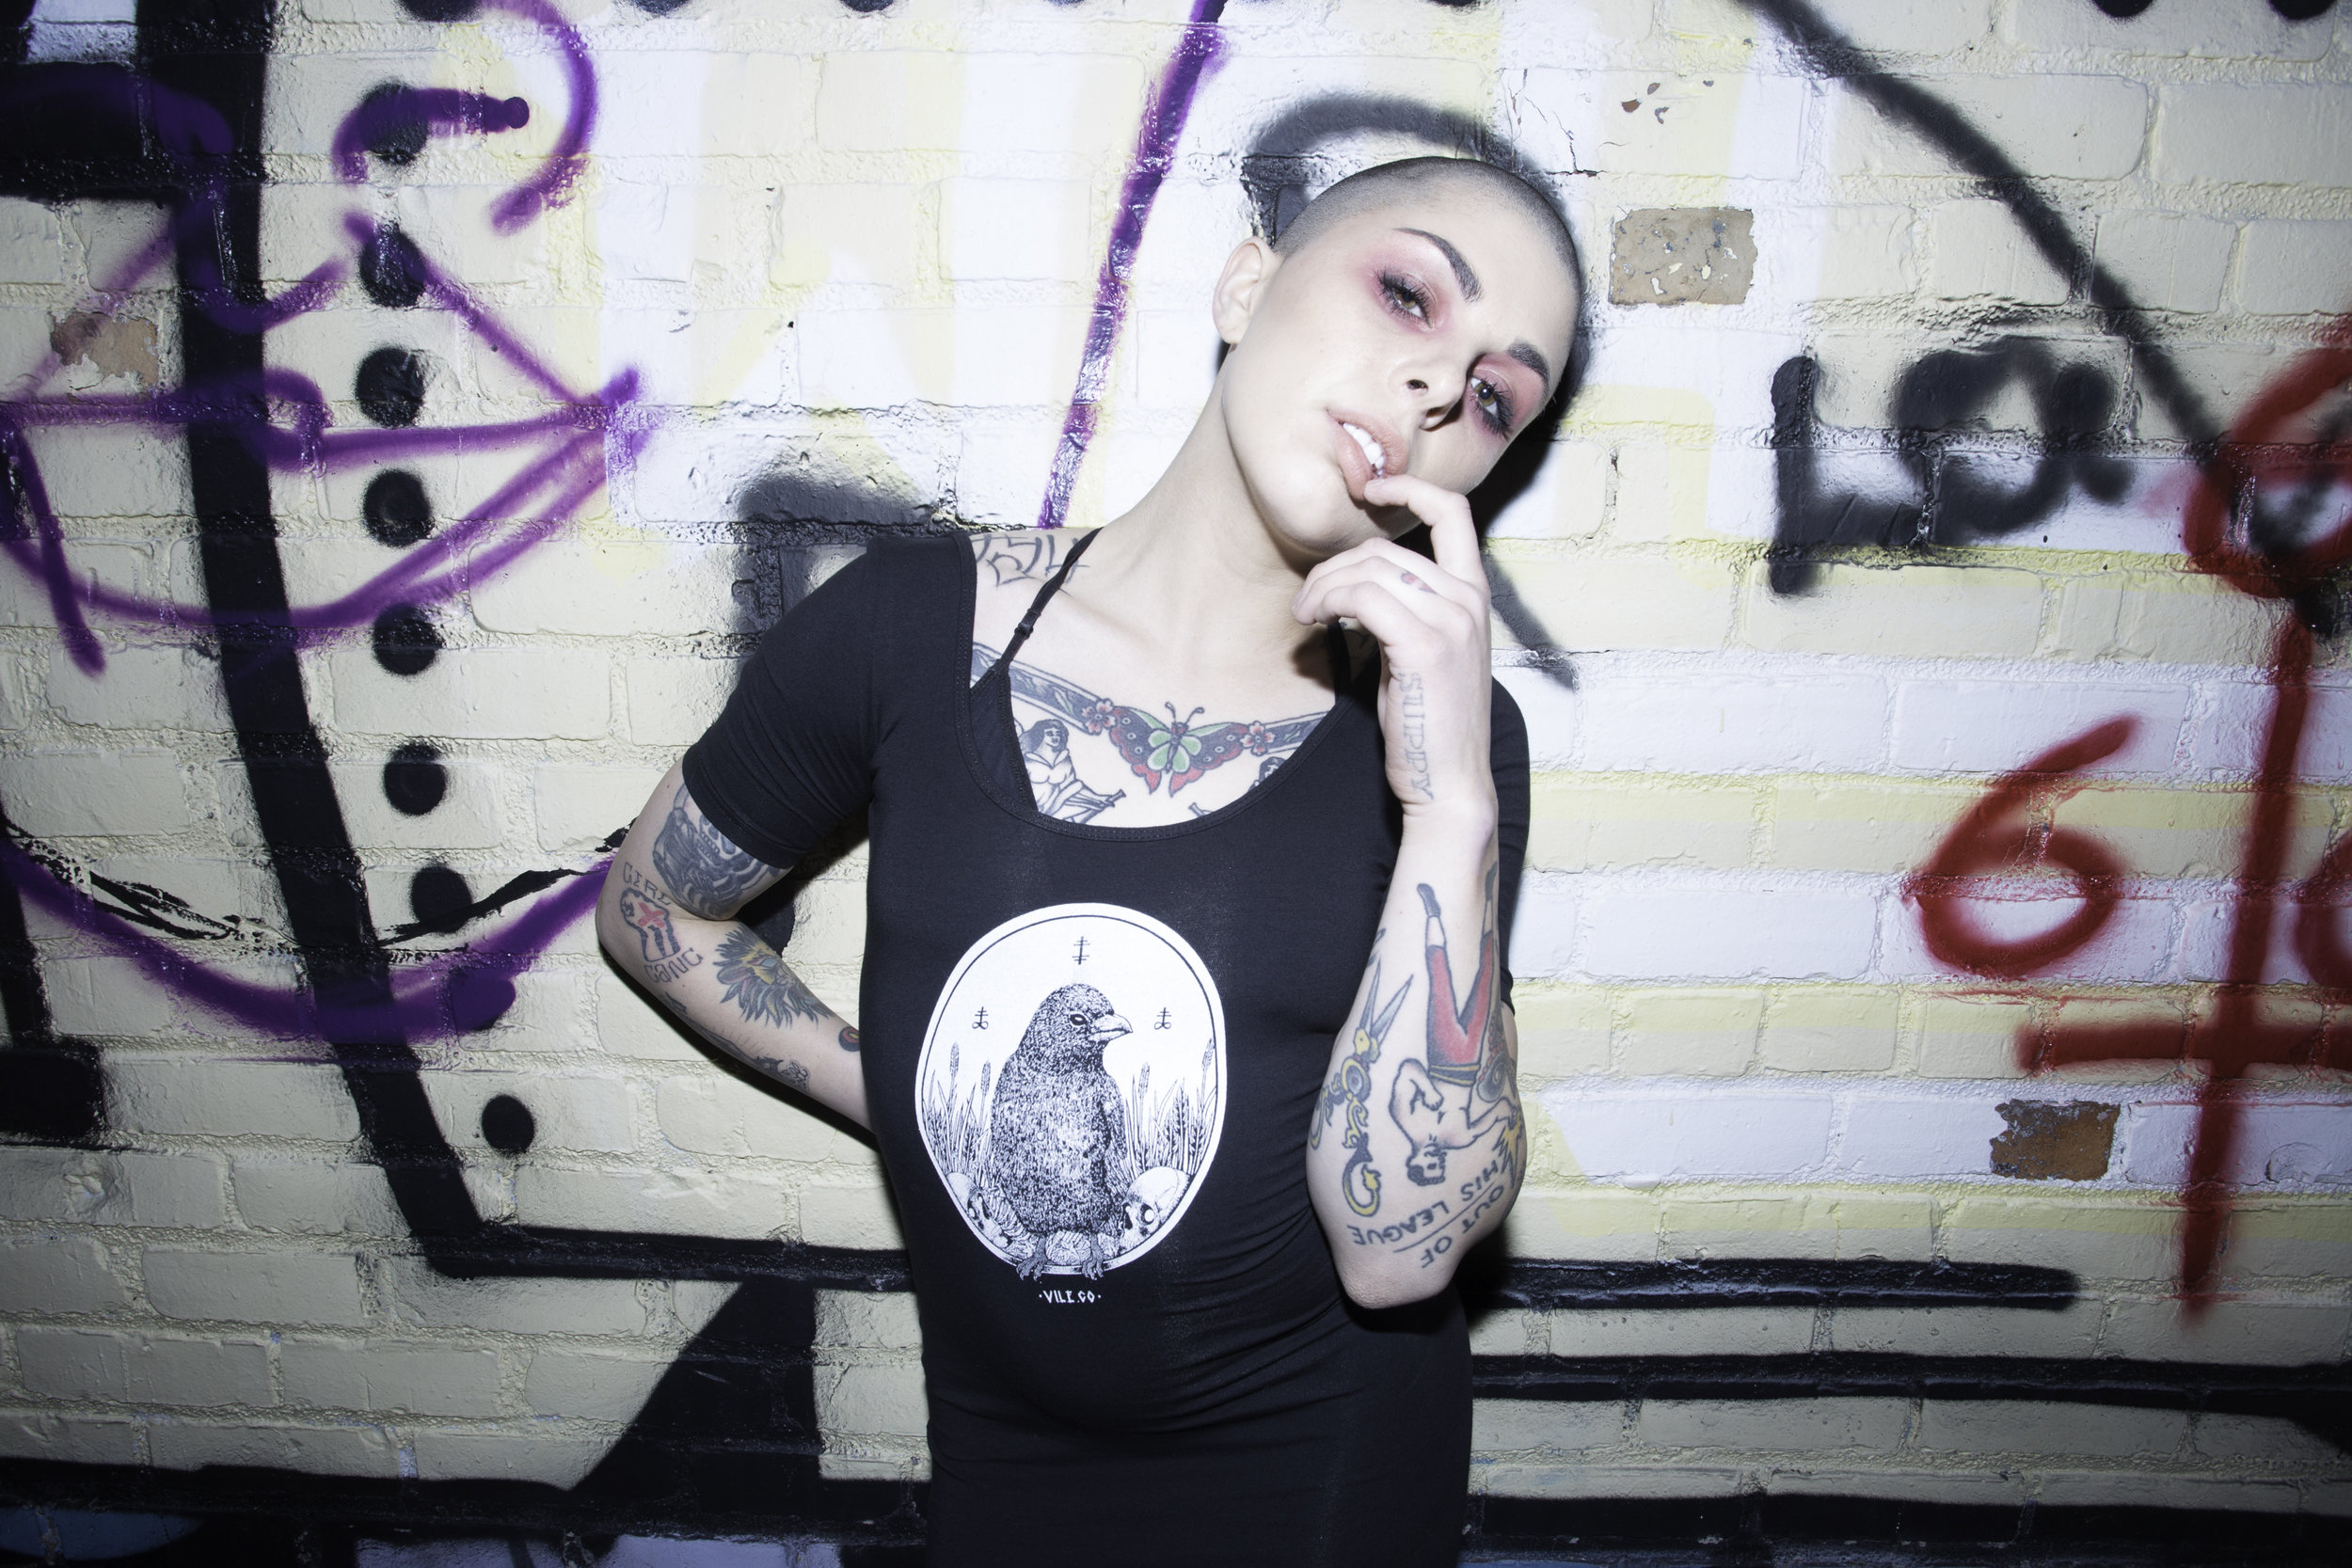 kirby_nevermore_dress_edit2_vile_vileco_vilegirls_girlsofvilecompany_vilecompany_detroit.jpg